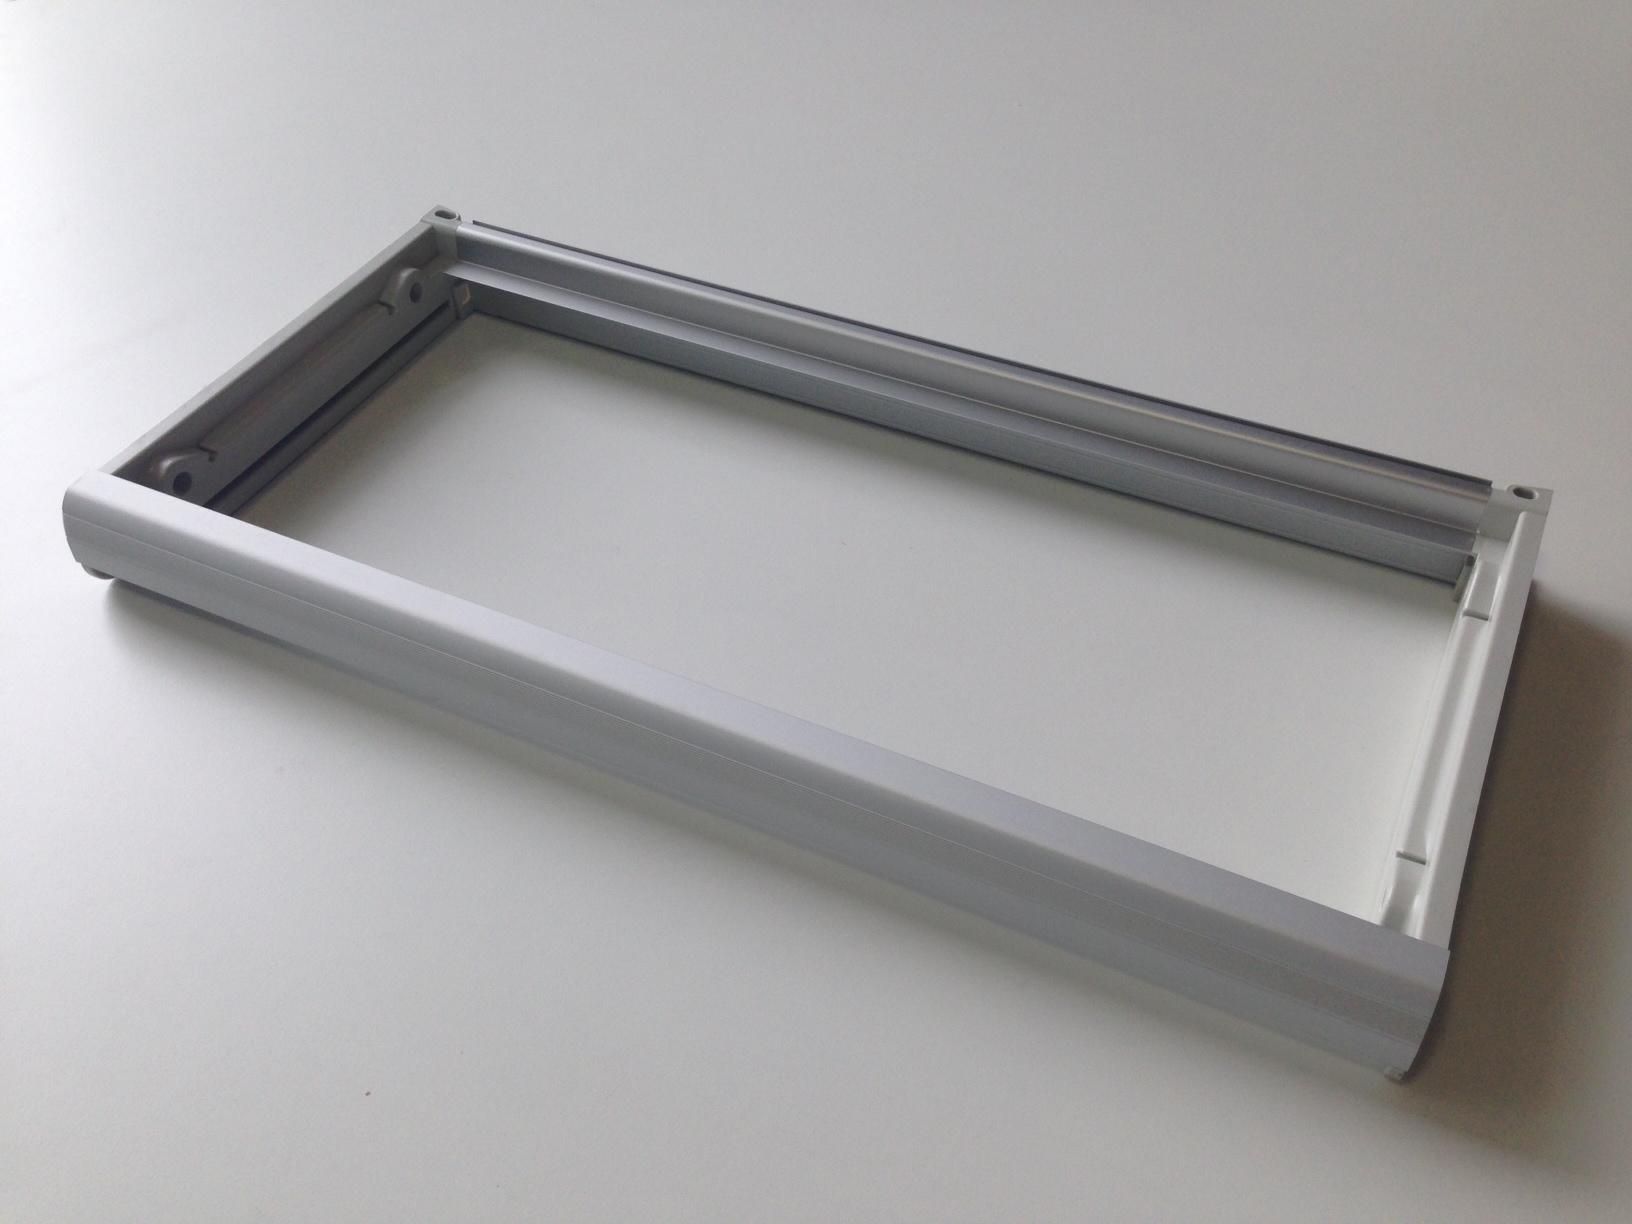 Рамка для сушки Elite/Ikona 600/564х280/330х71мм, Ardesia (альт.516I/60T)